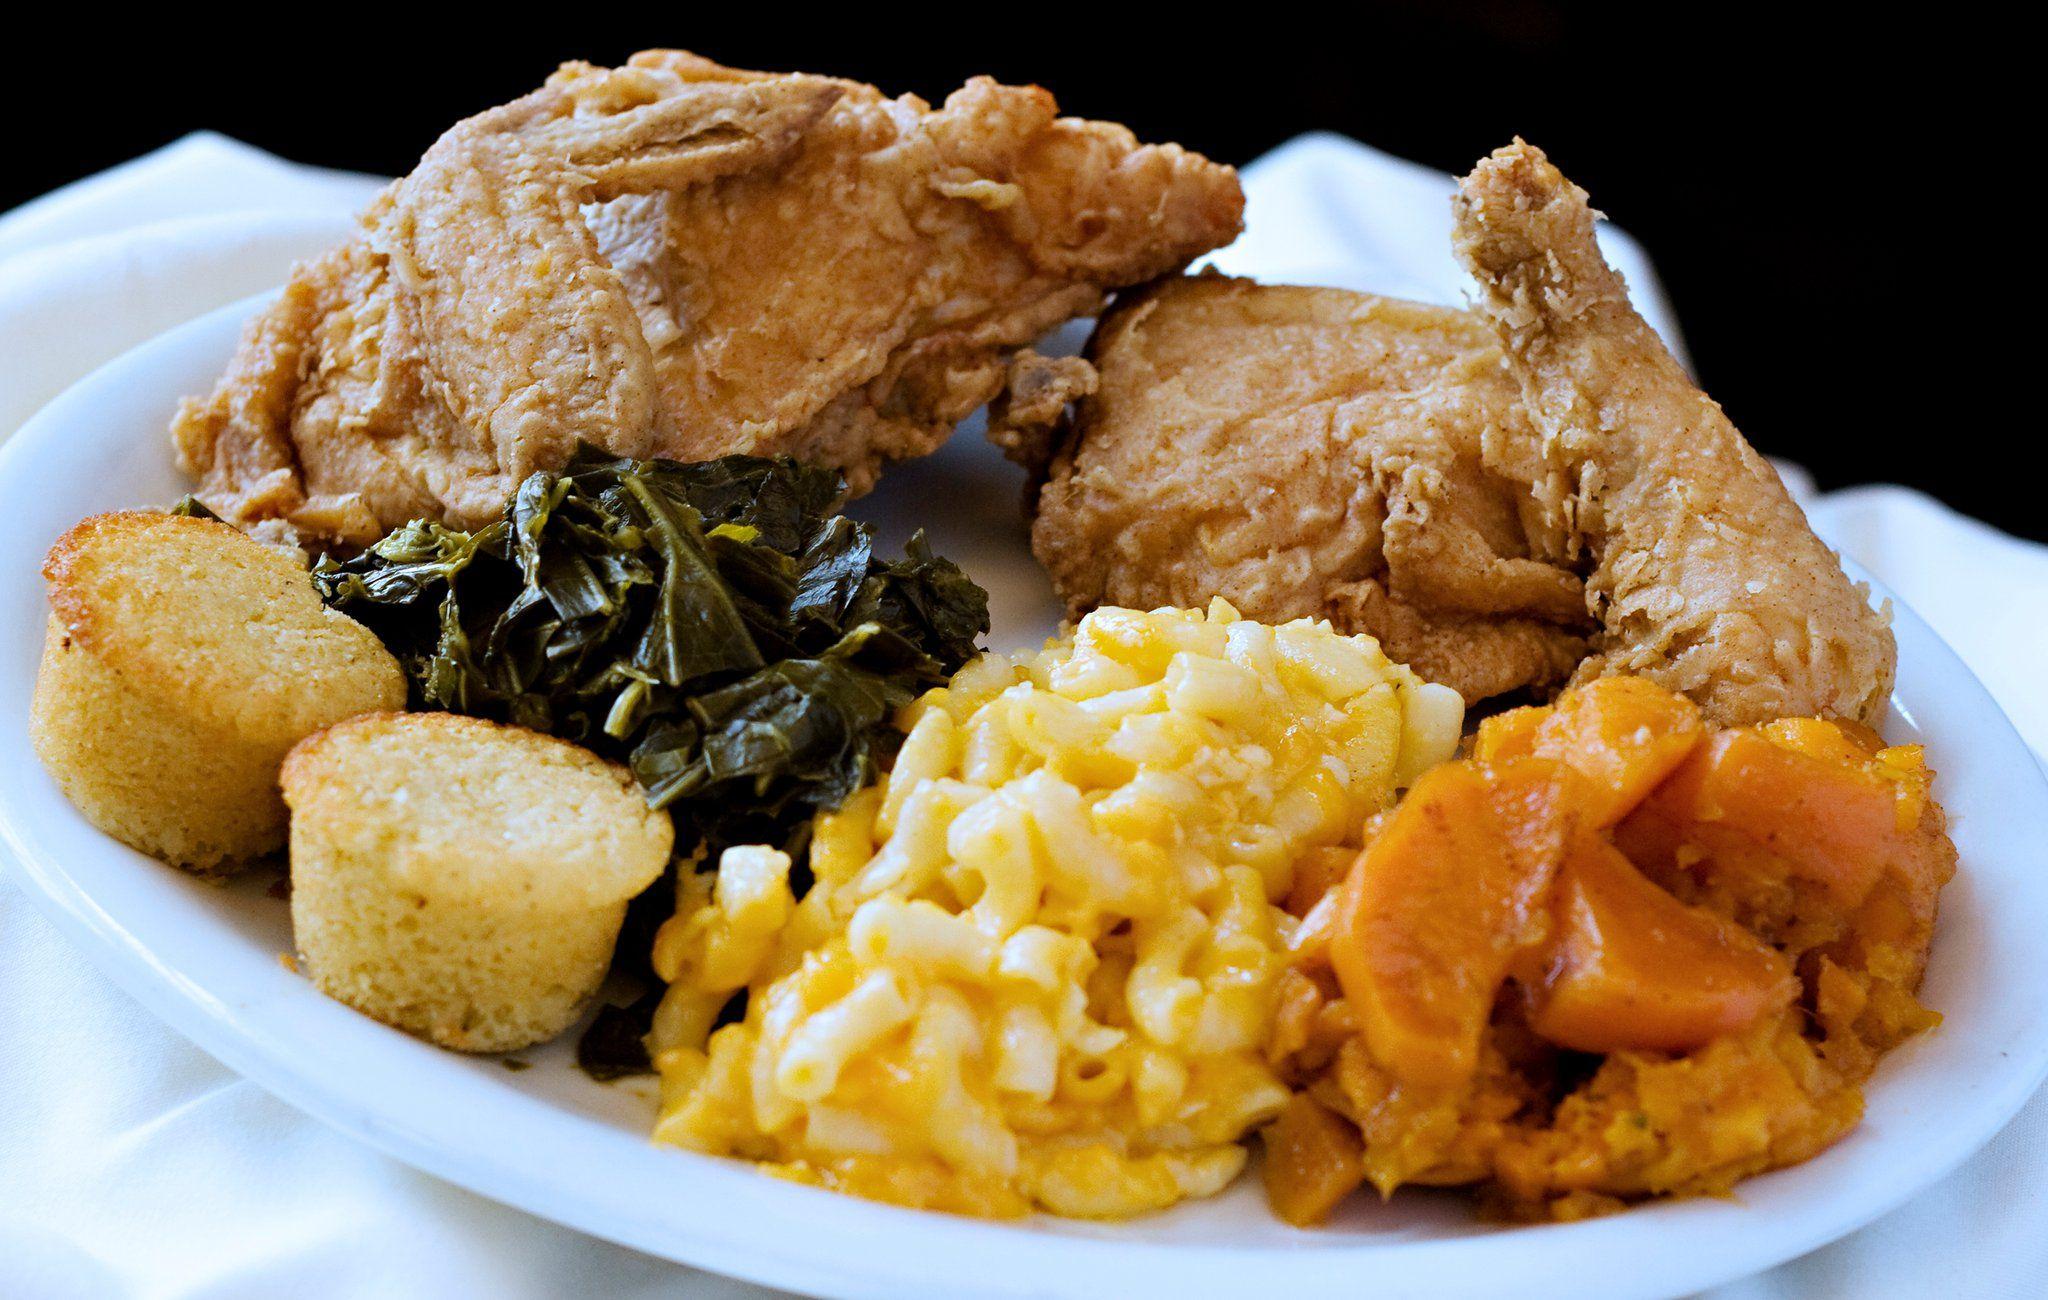 Paschals famous 1947 fried chicken soul food restaurant